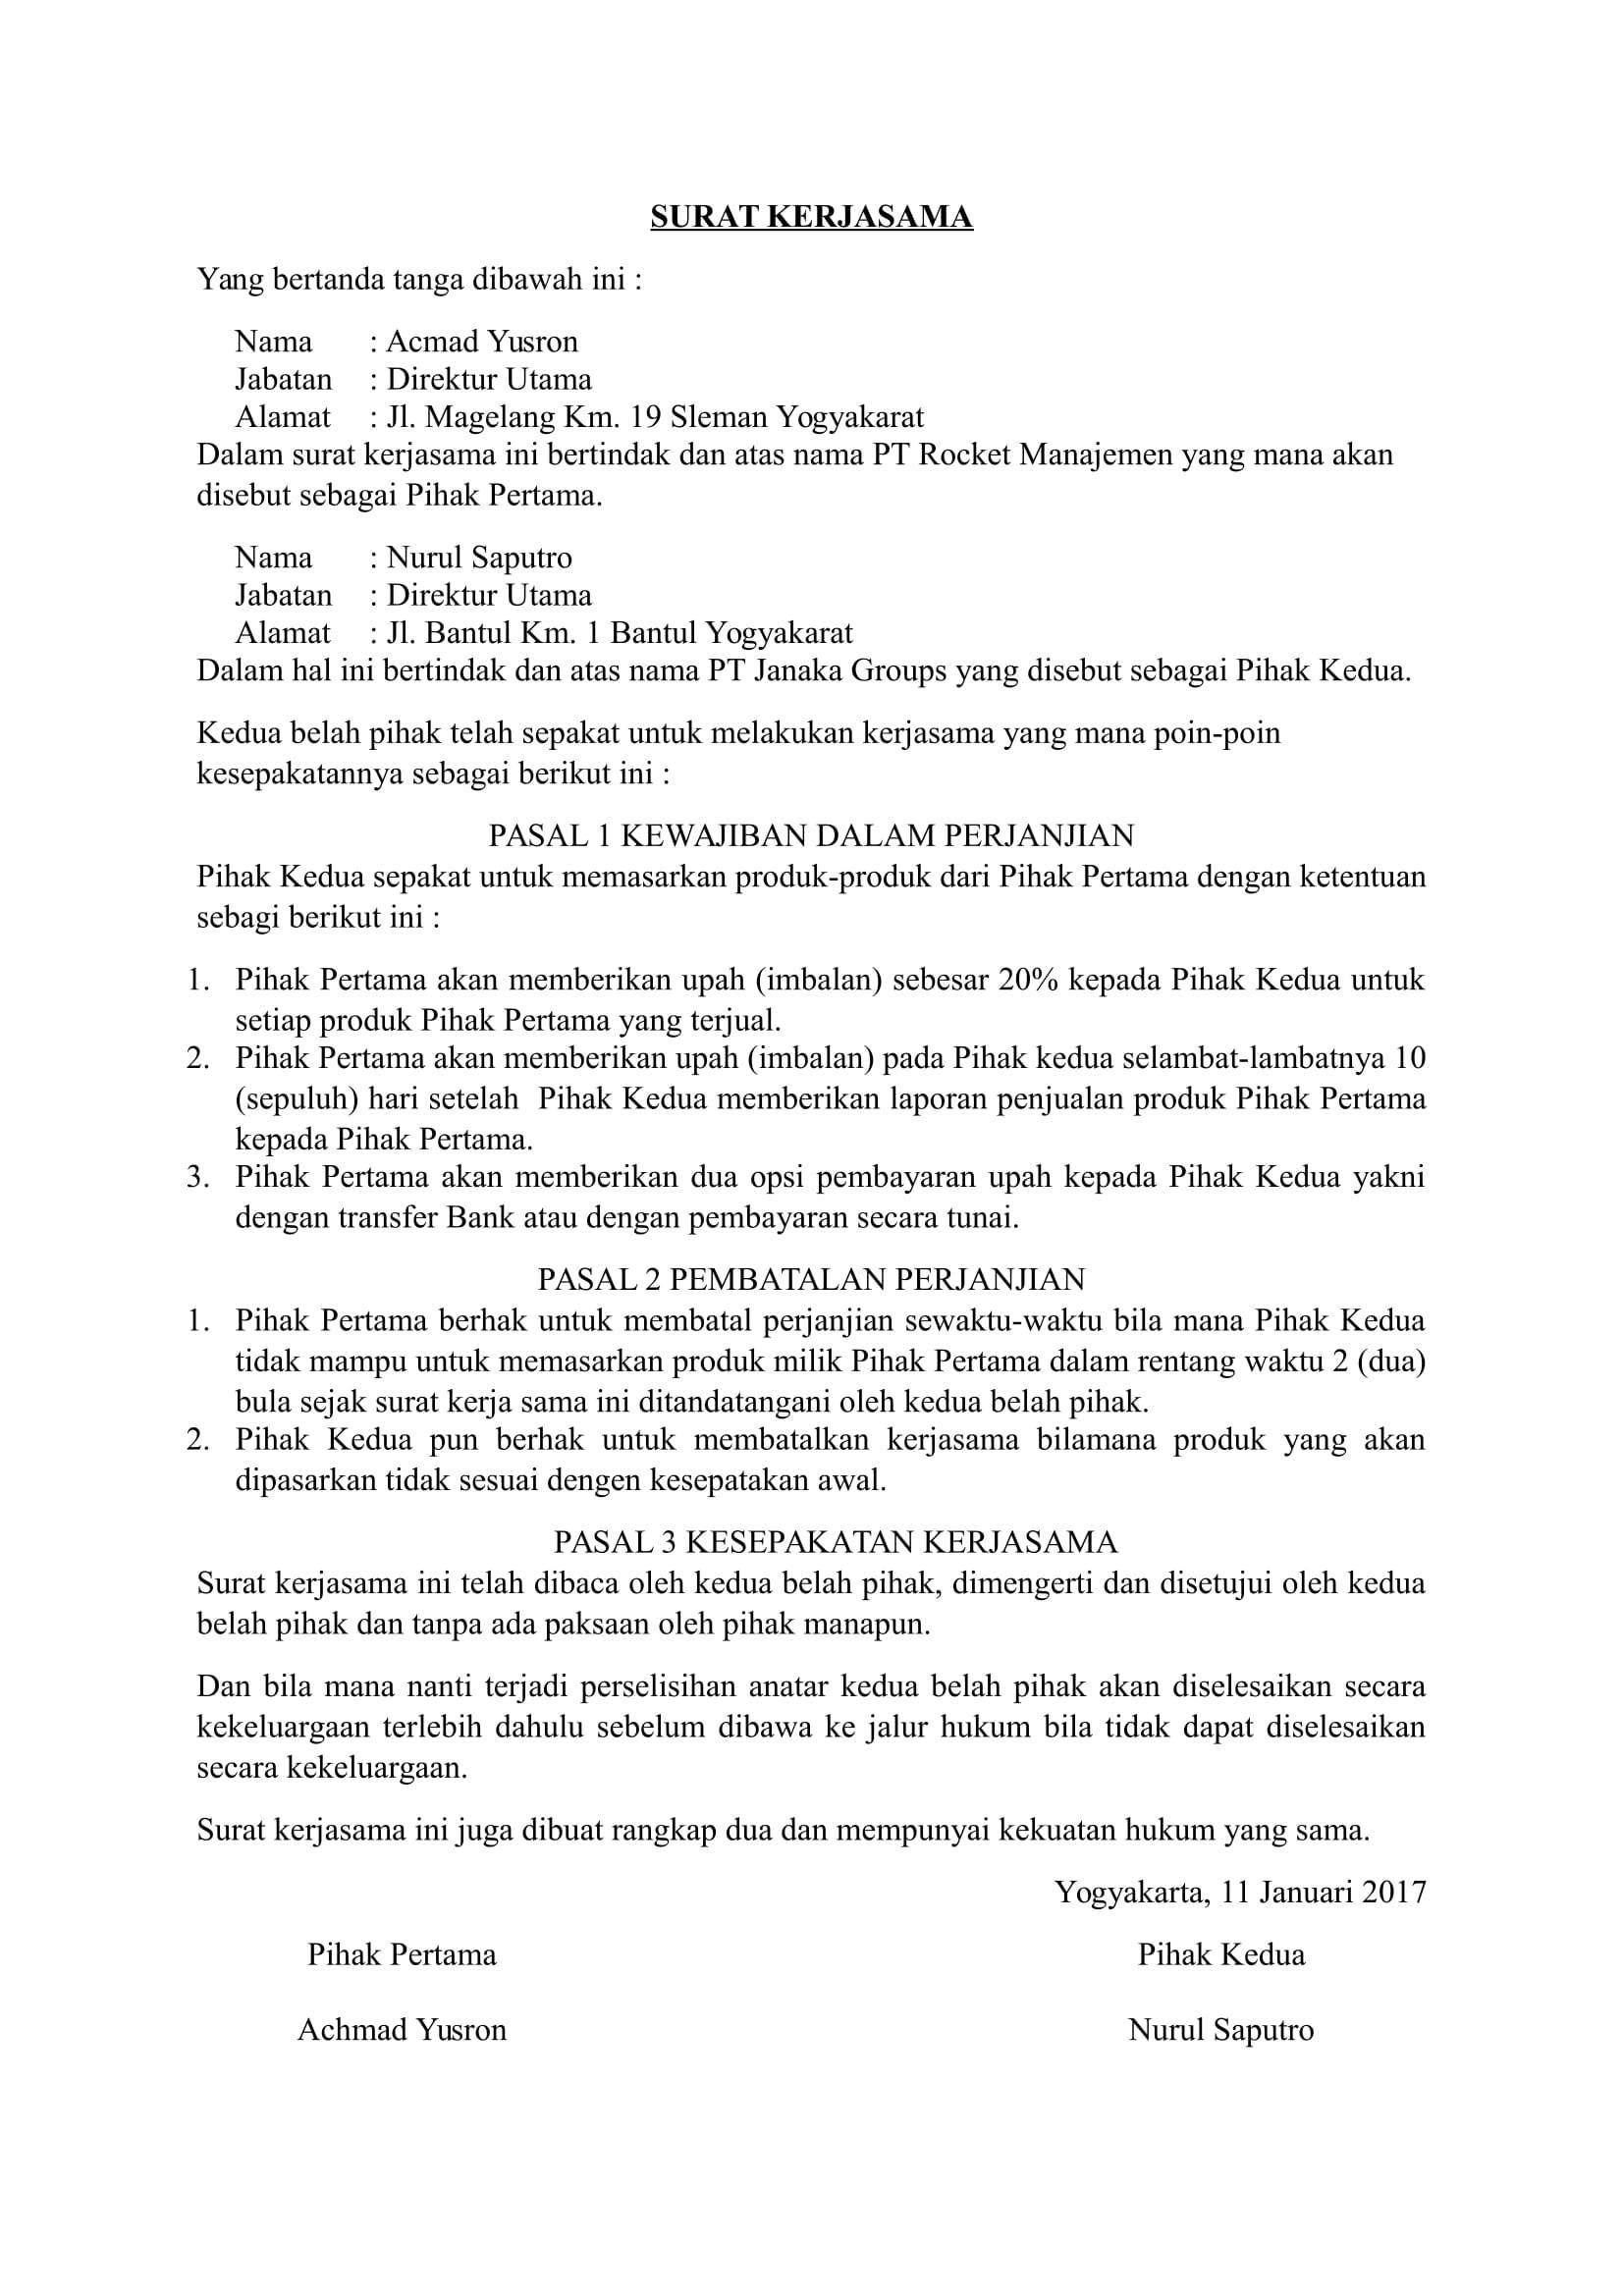 Contoh Surat Kerjasama Surat Tanda Pemerintah